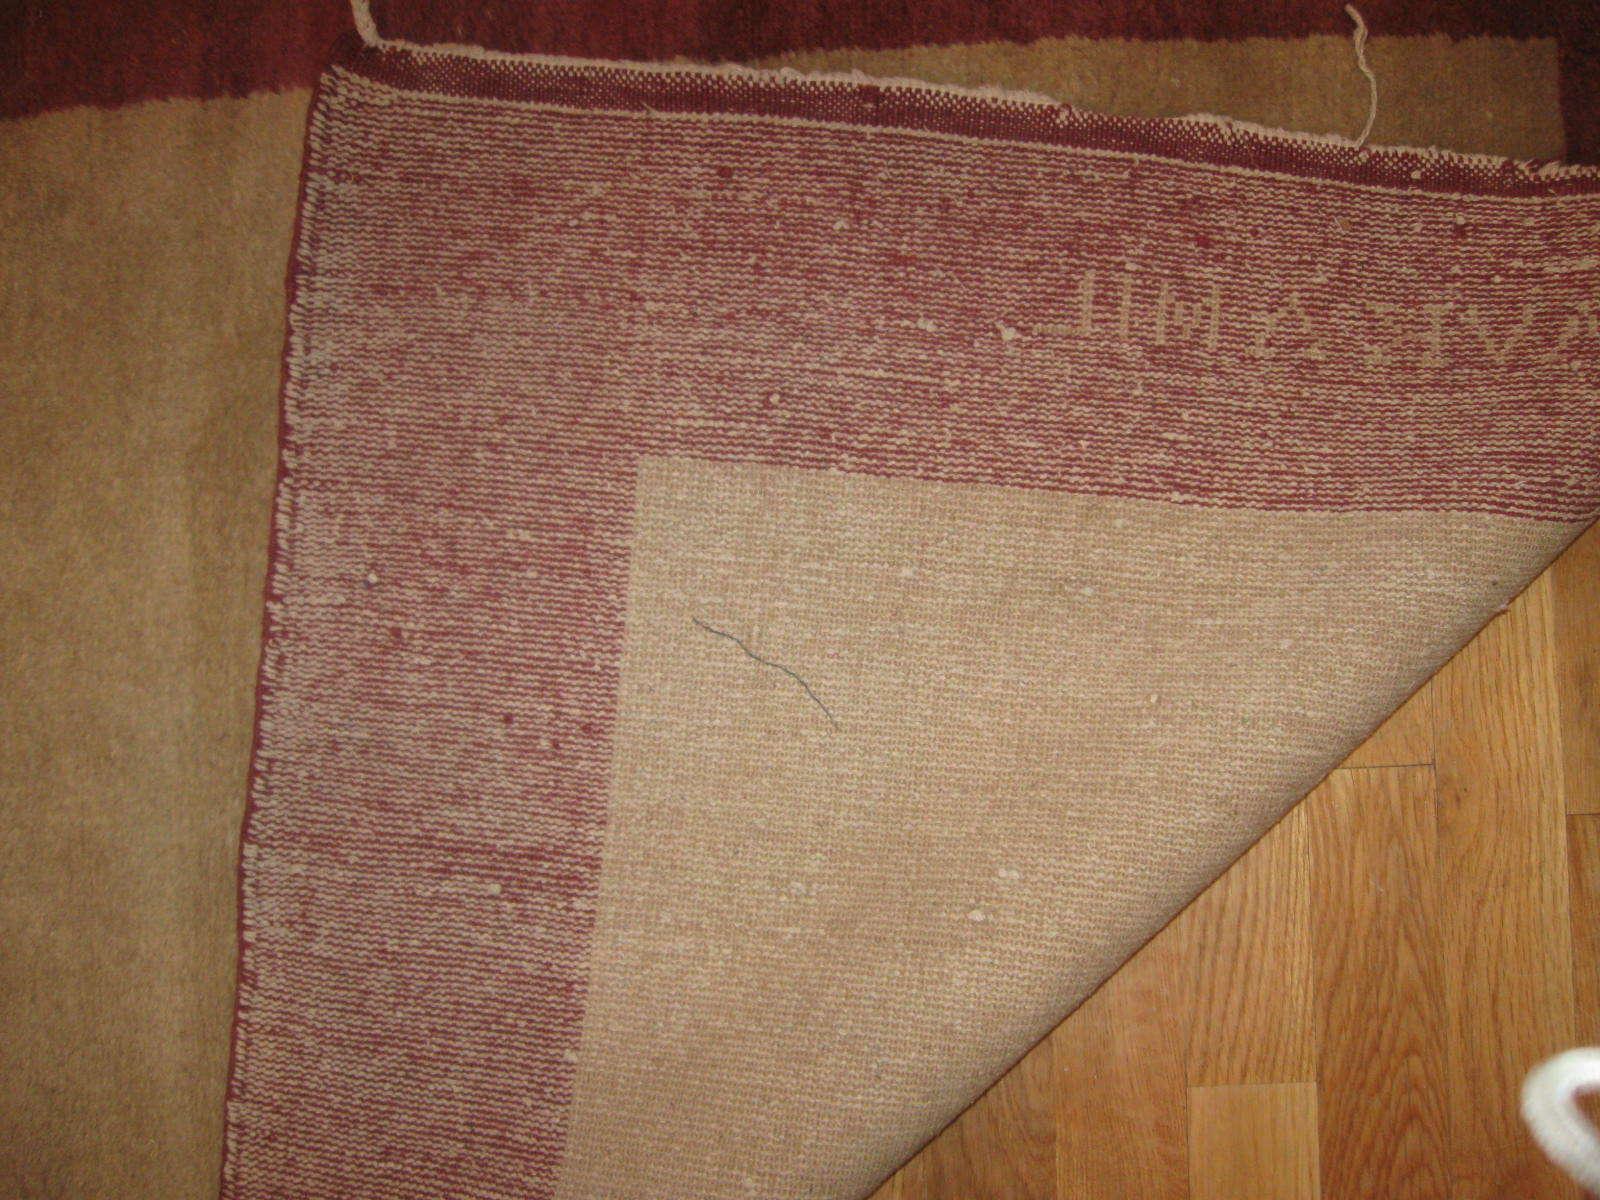 24260 Chinese Fetti hall runner rug 3,3 x 19,6 (1)